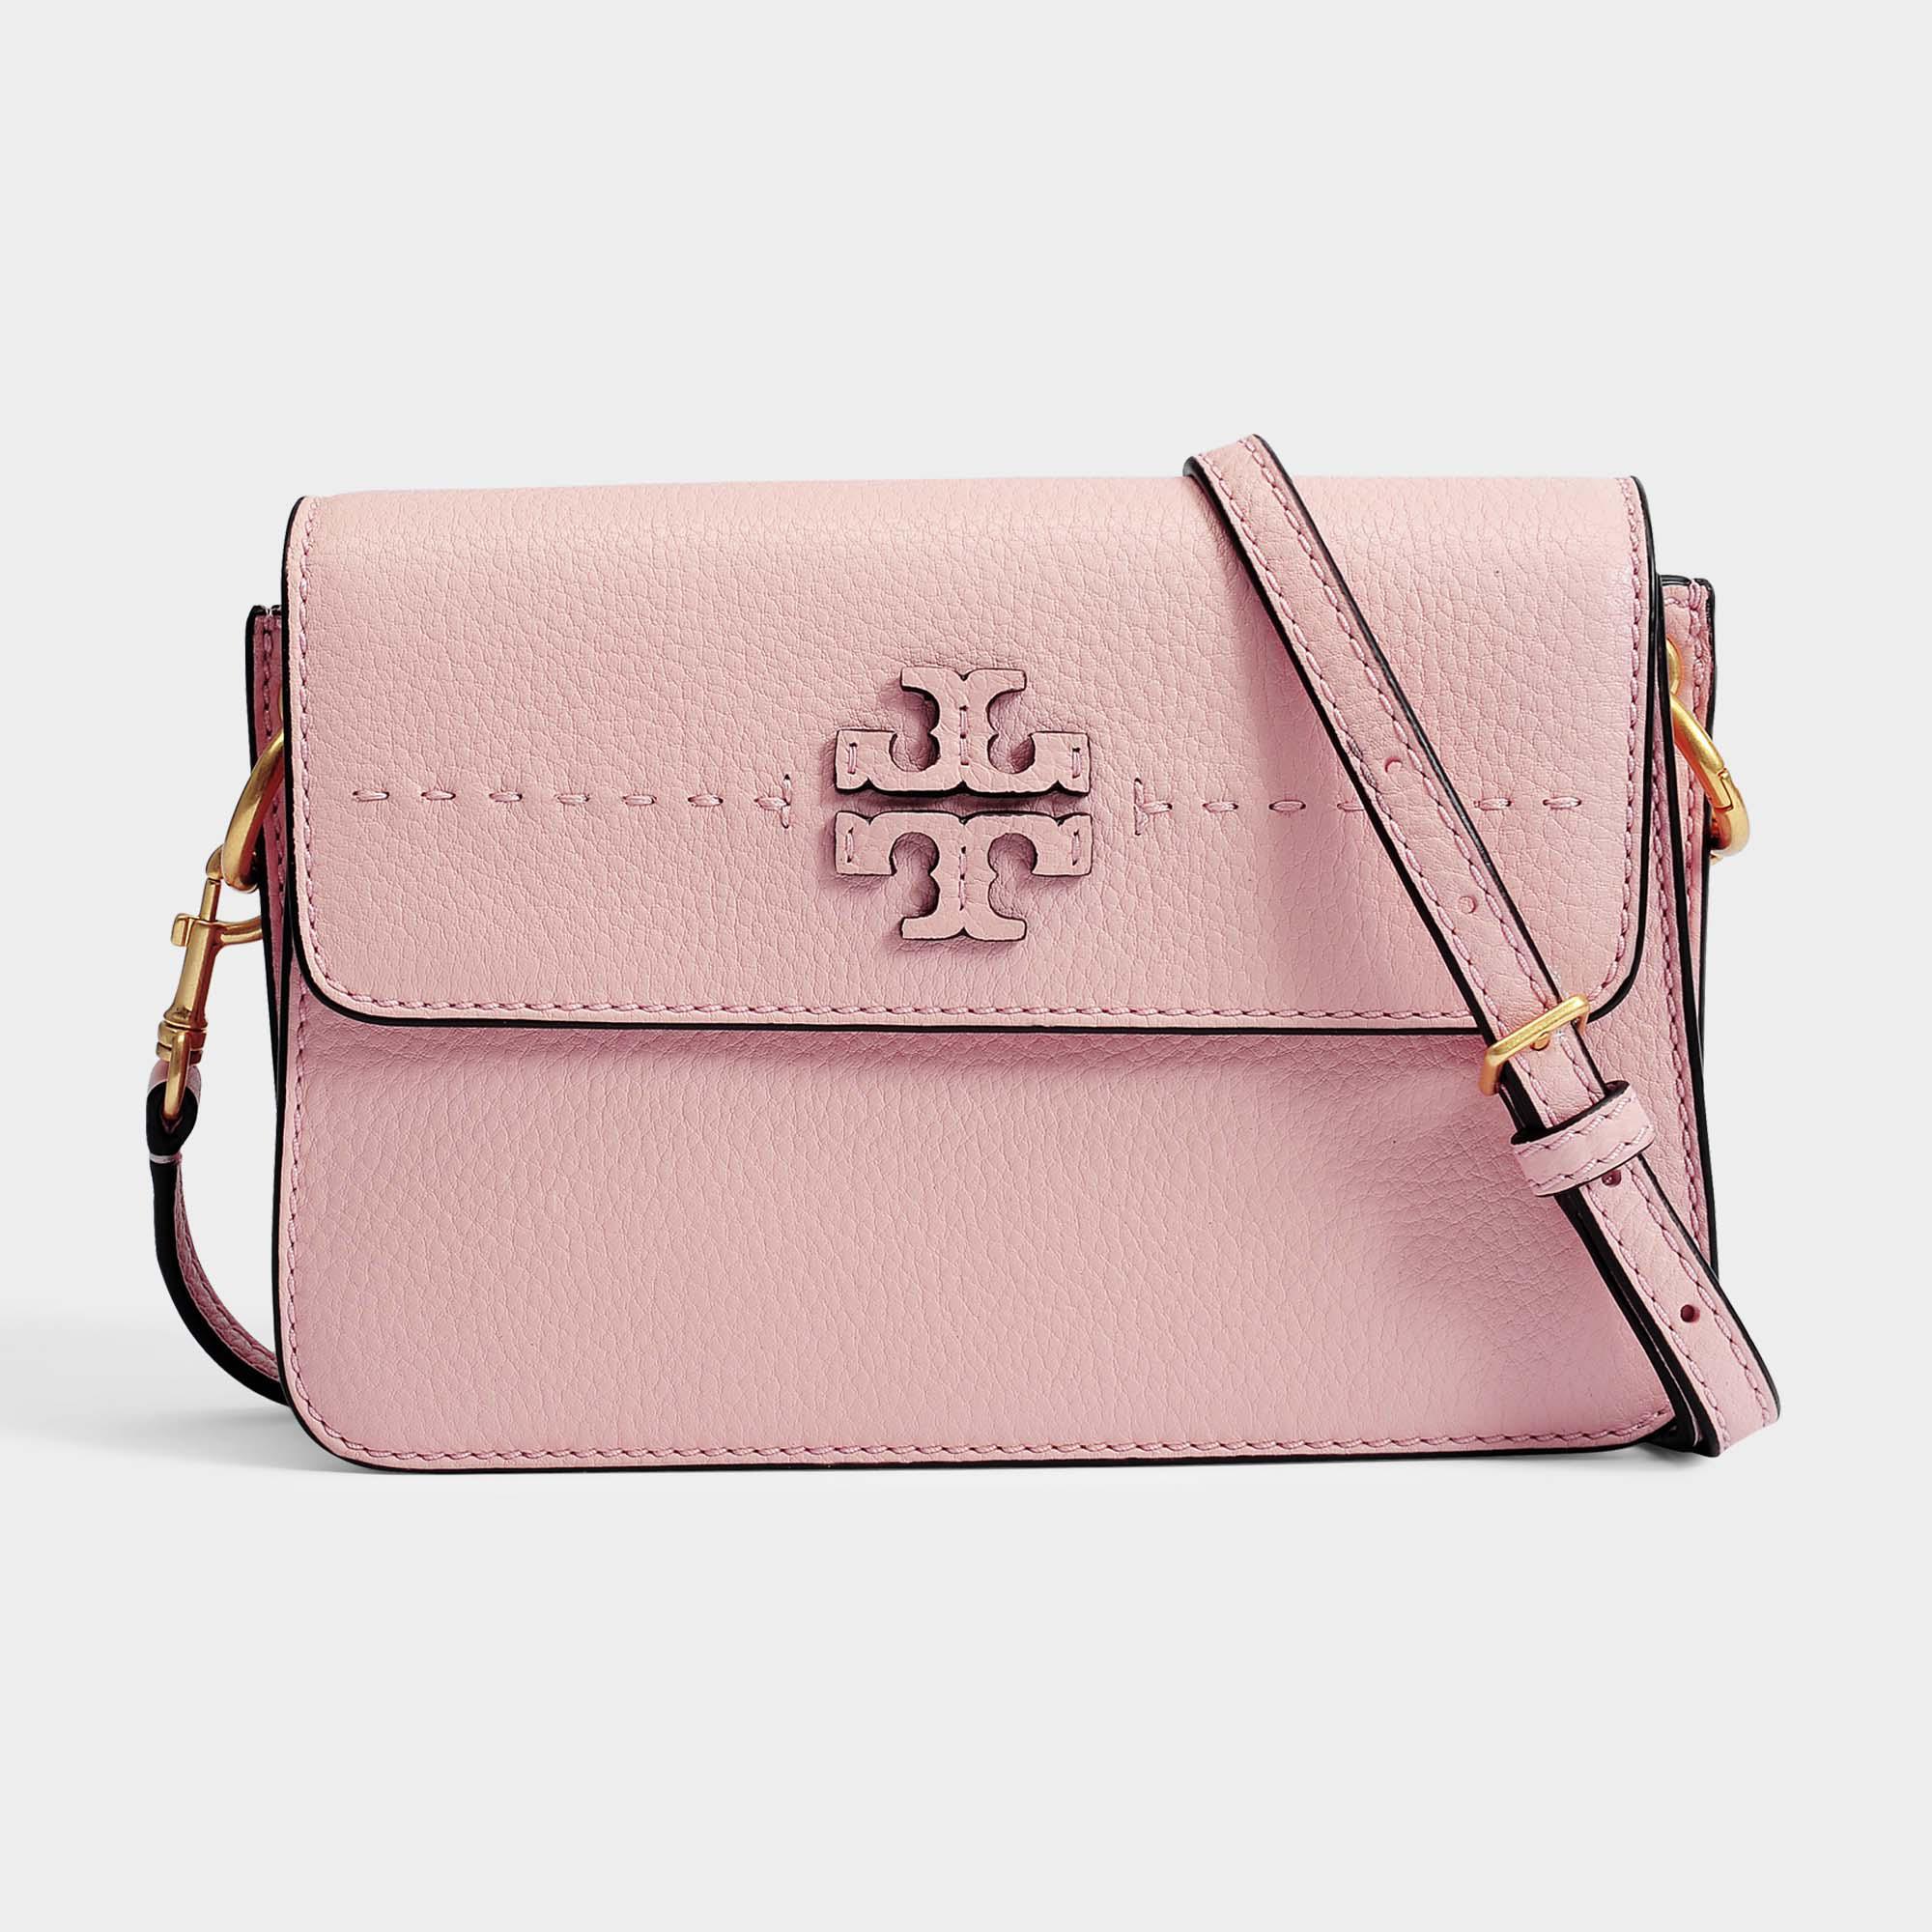 267e07605 Tory Burch Mcgraw Crossbody Bag in Pink - Lyst